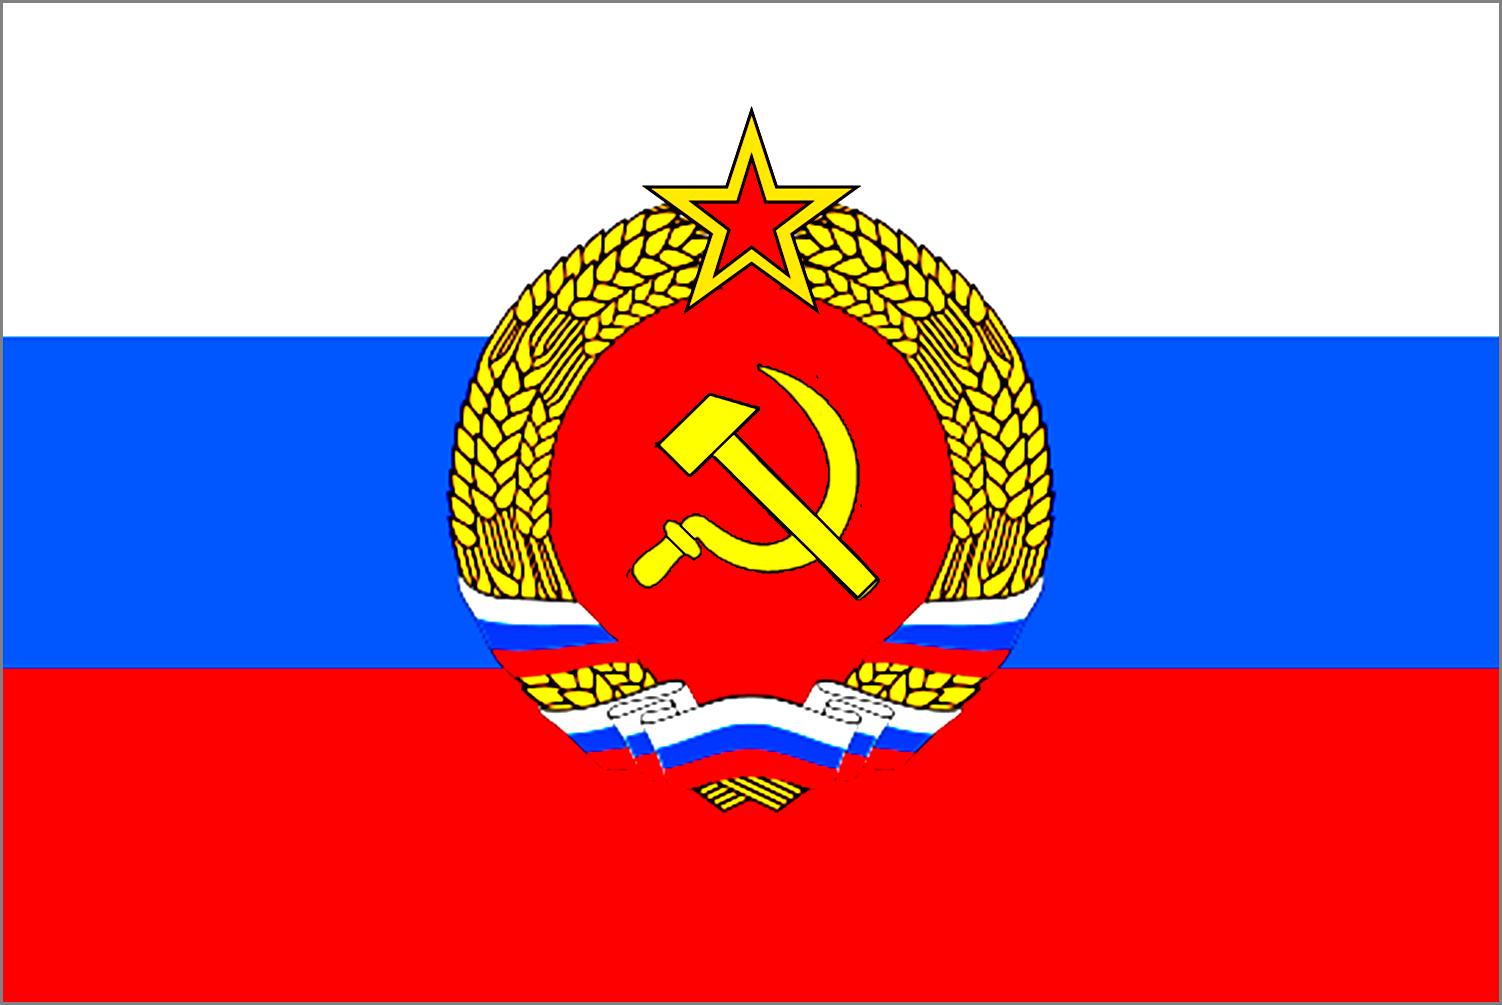 russia not the ussr west no longer capitalist democratic freenations